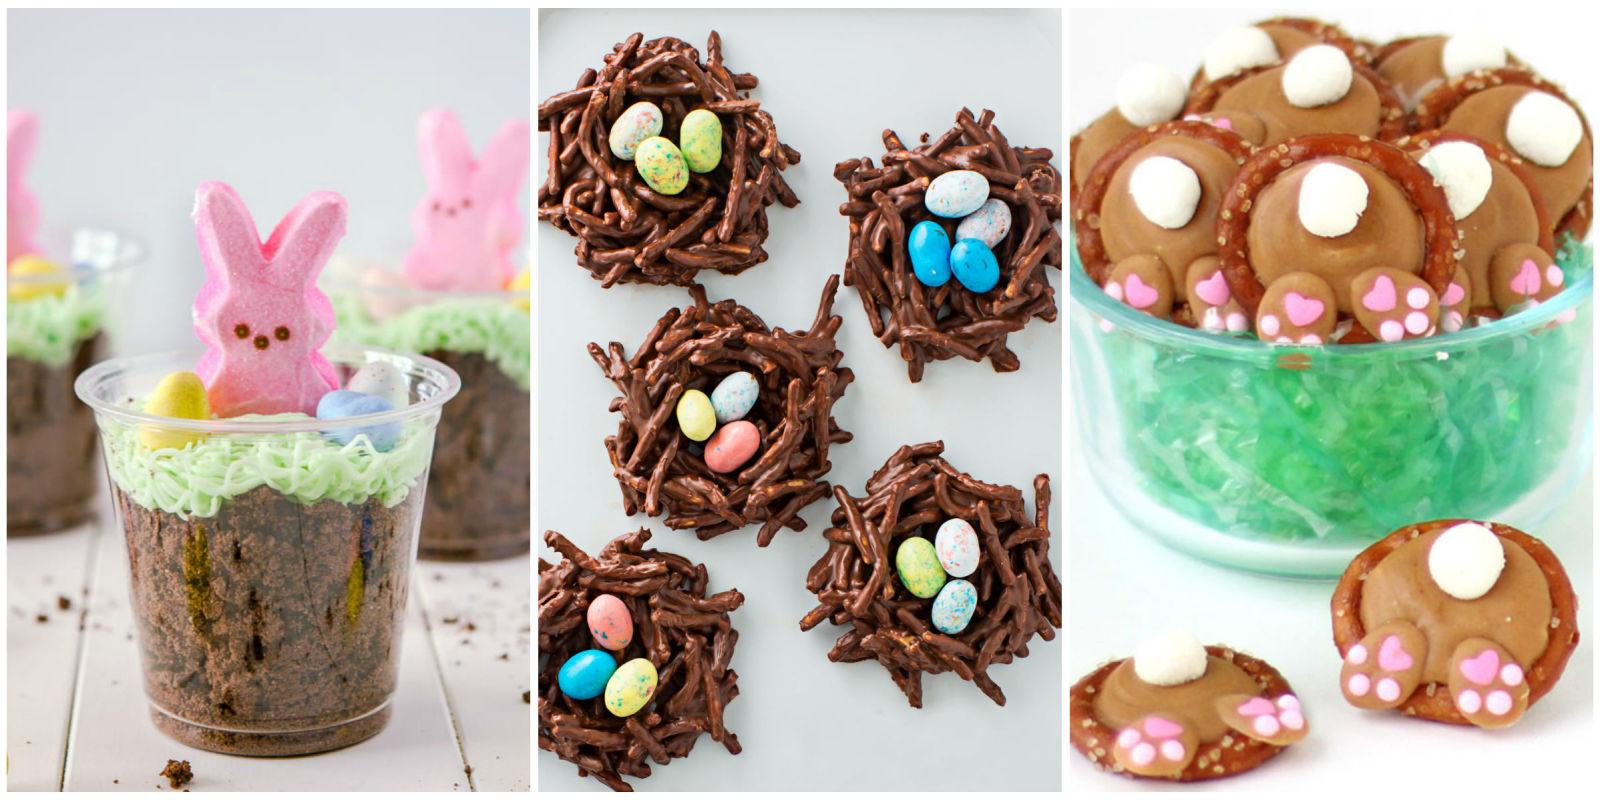 Homemade Easter Decorating Ideas   homedecoringideas.us